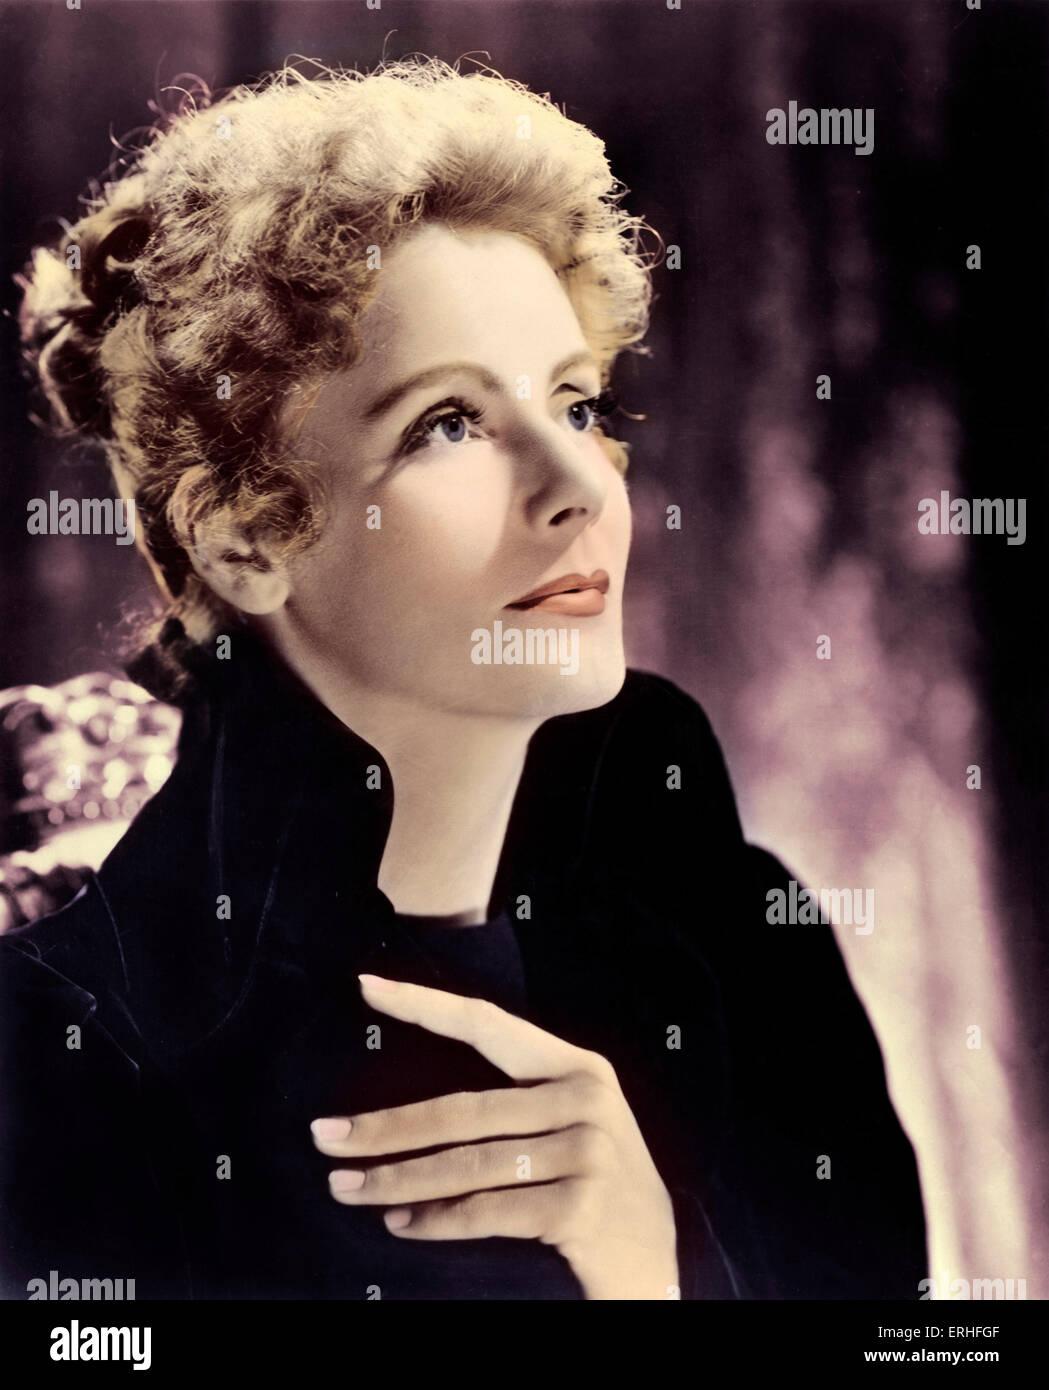 Greta Garbo- portrait as title role in Marie Walewska, 1937 - Swedish film star - 18 September 1905 - 15 April 1990 - Stock Image